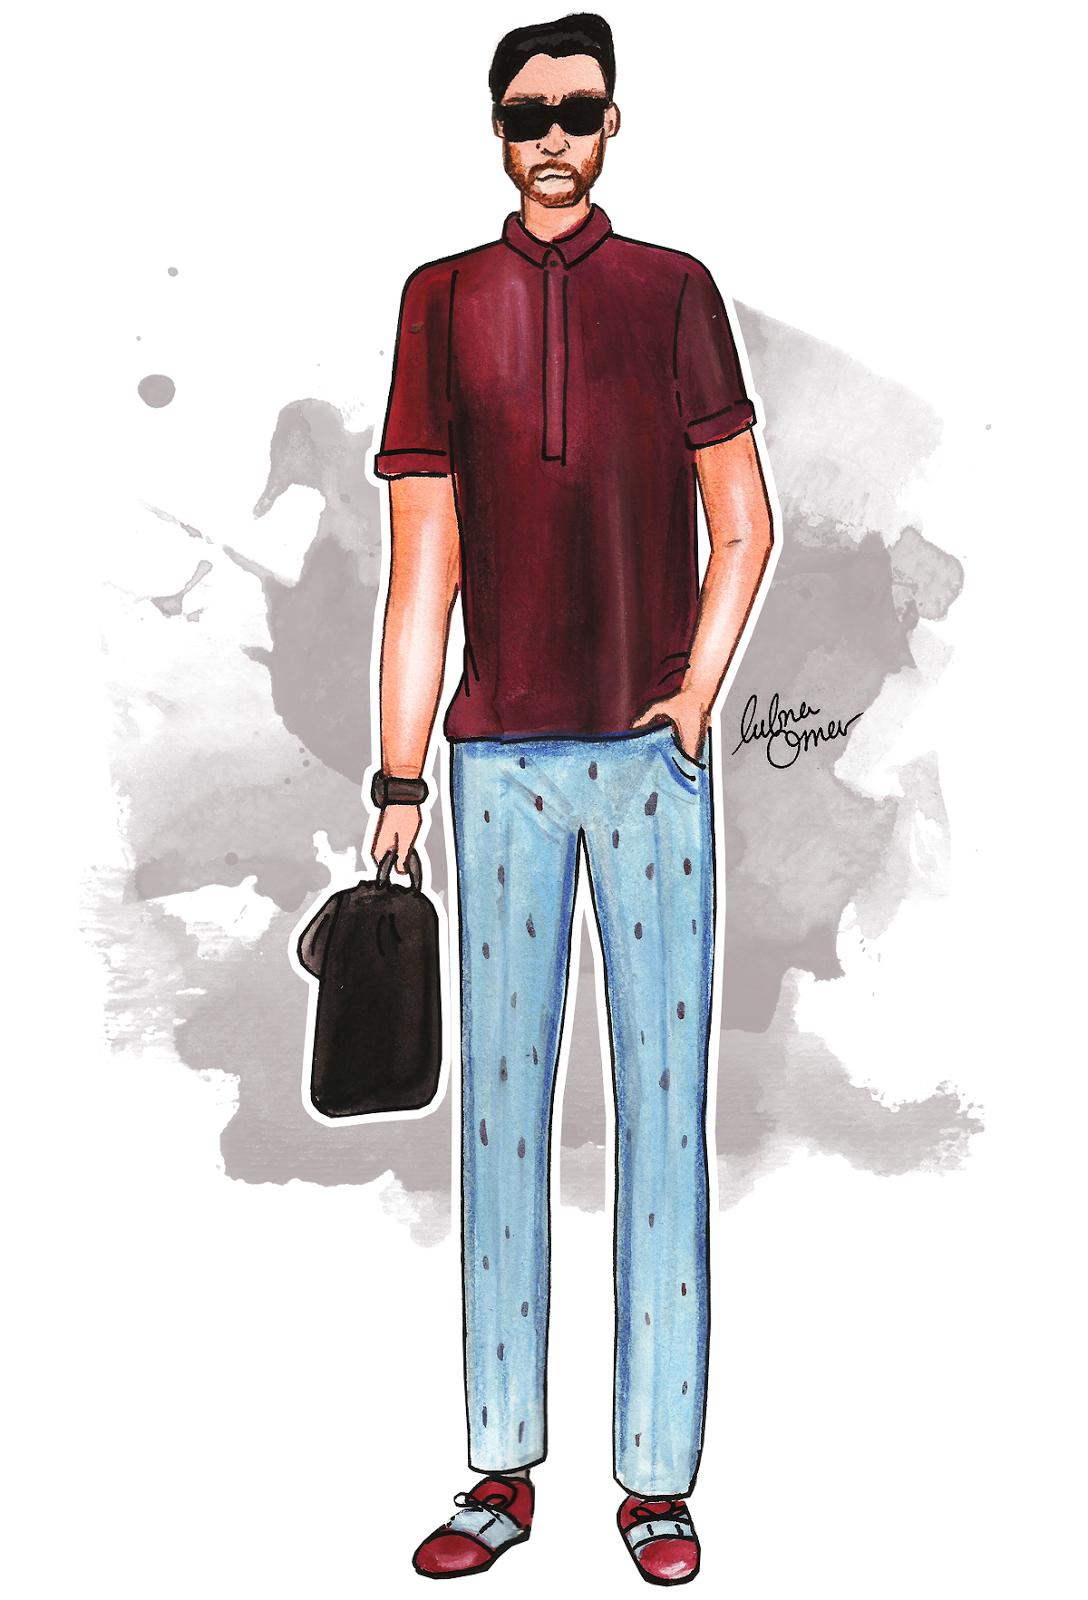 Filippo Fiora illustration by lubna omar